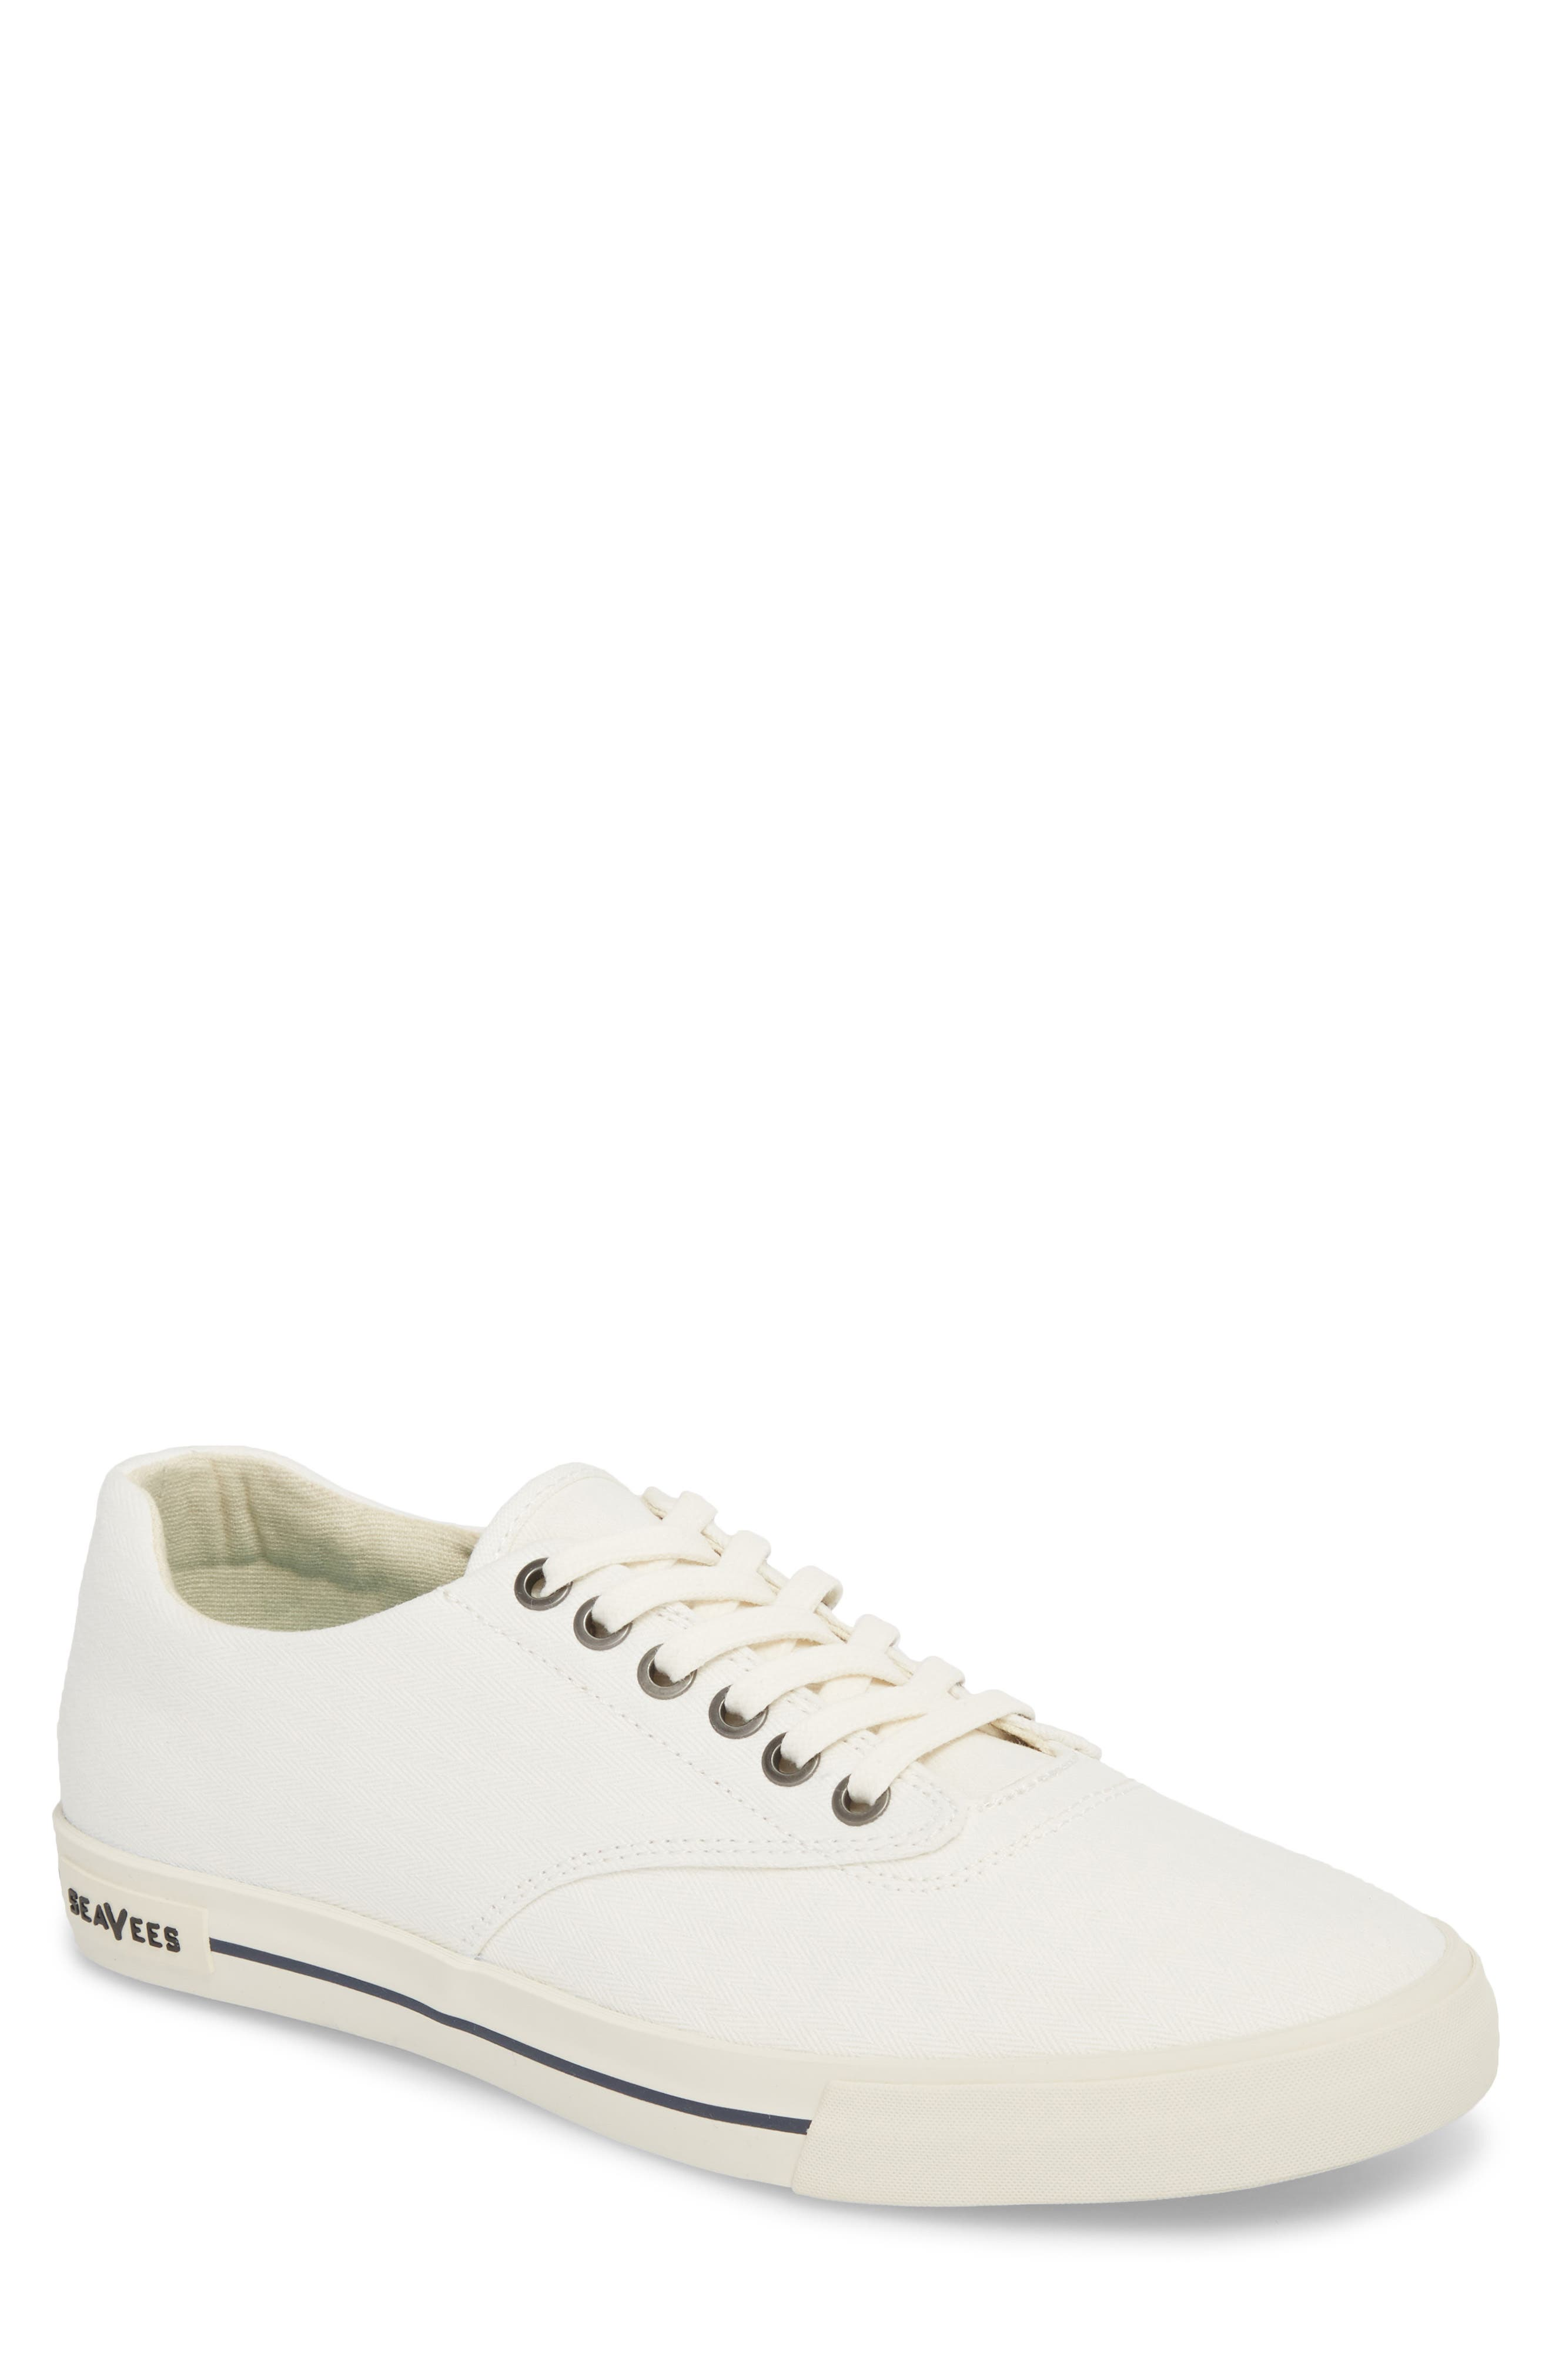 SEAVEES,                             Hermosa Plimsoll Sneaker,                             Main thumbnail 1, color,                             125